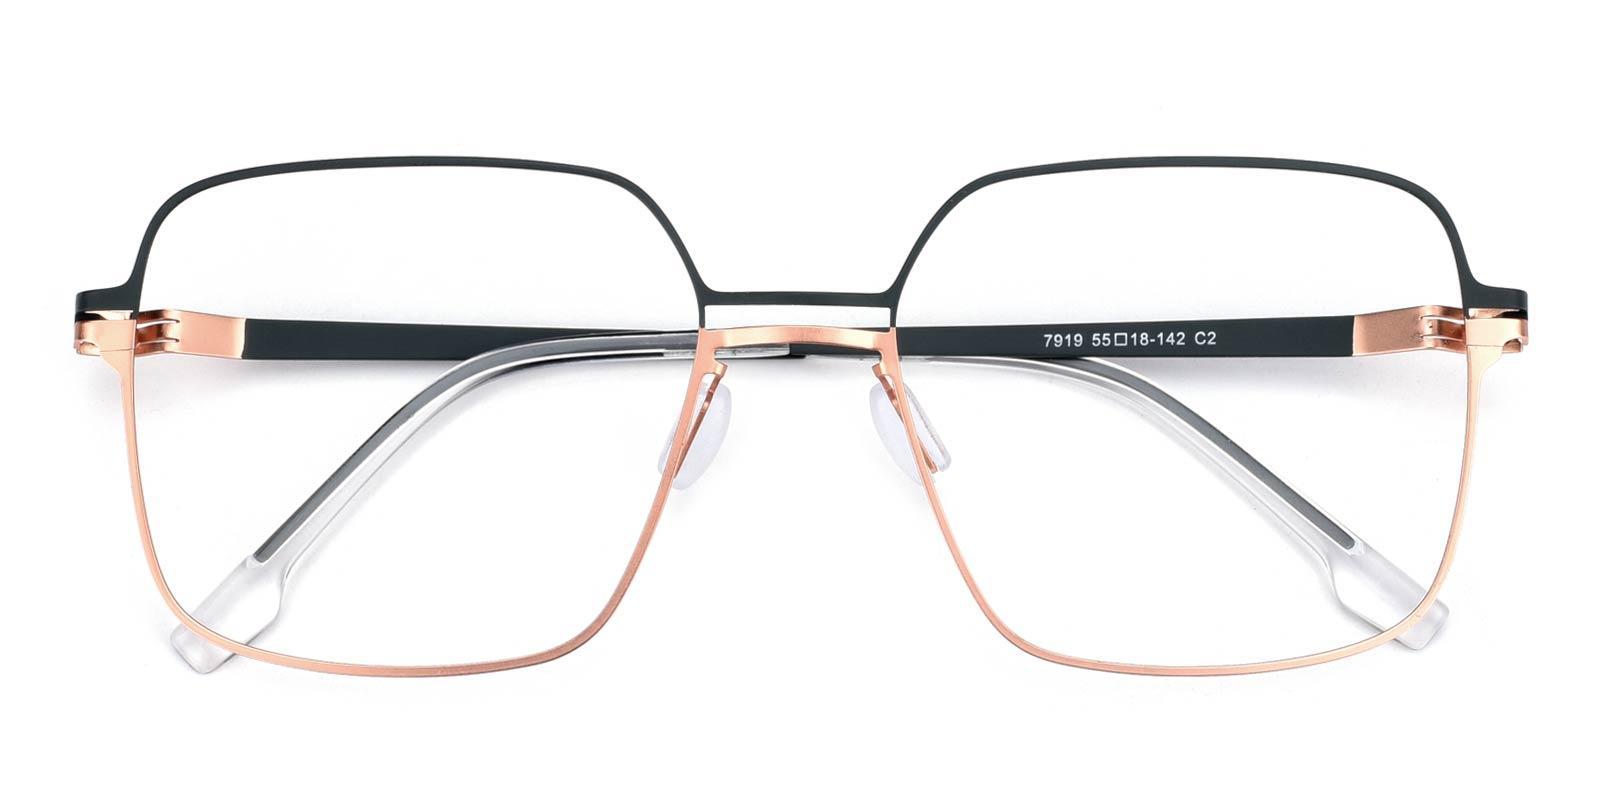 Concert-Green-Square-Metal-Eyeglasses-detail